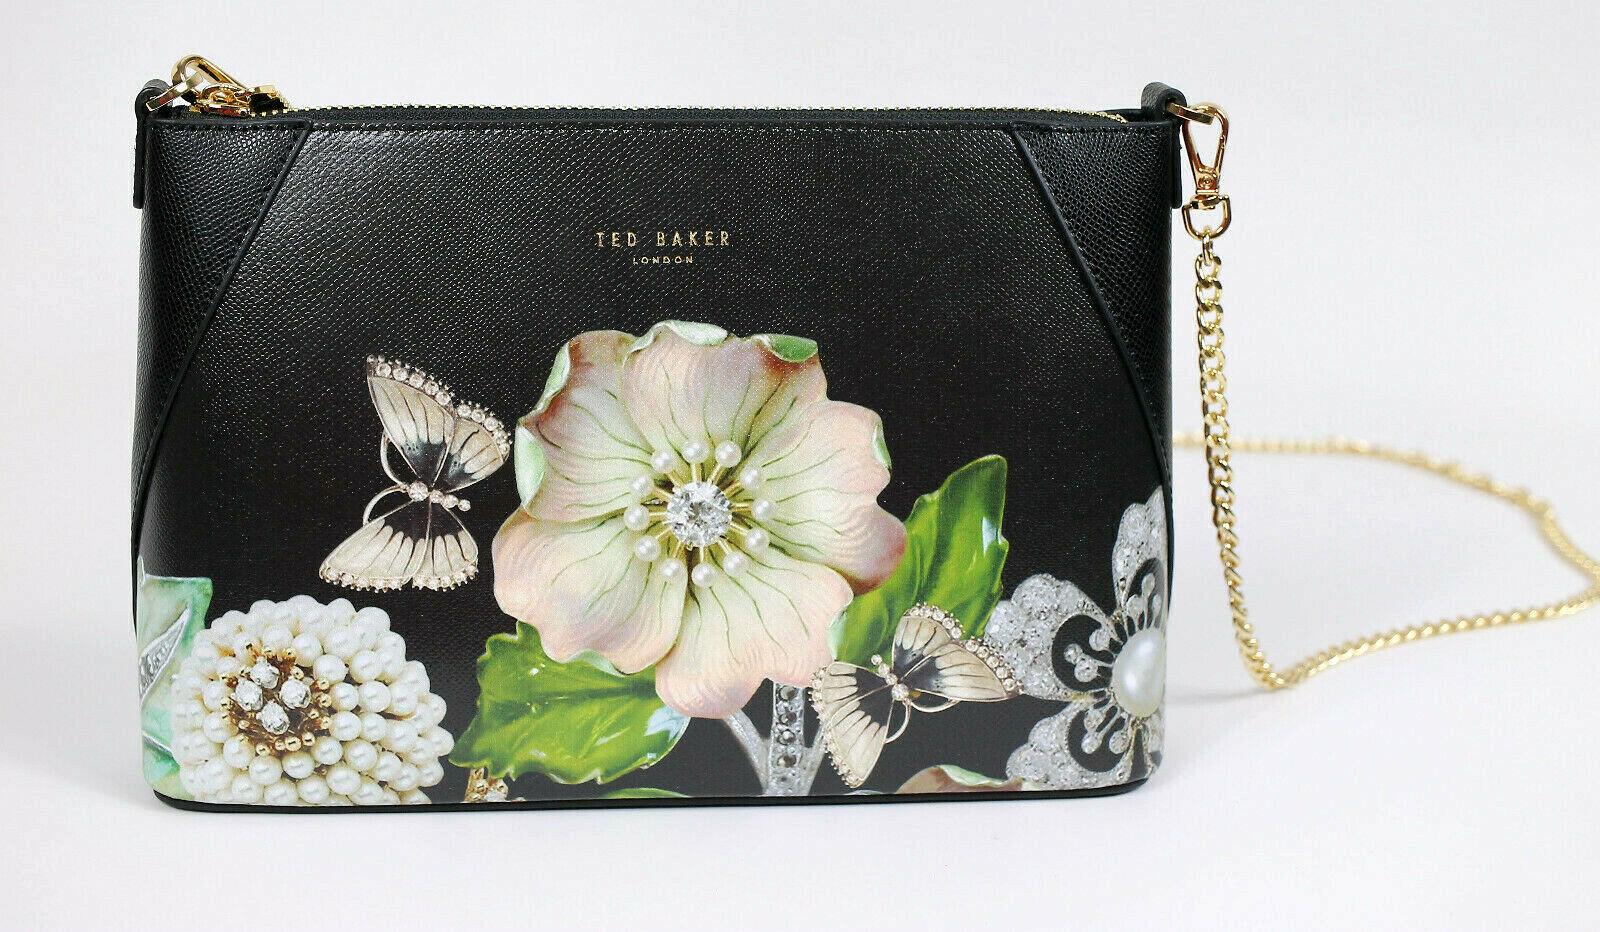 london alyssa gem gardens leather crossbody bag